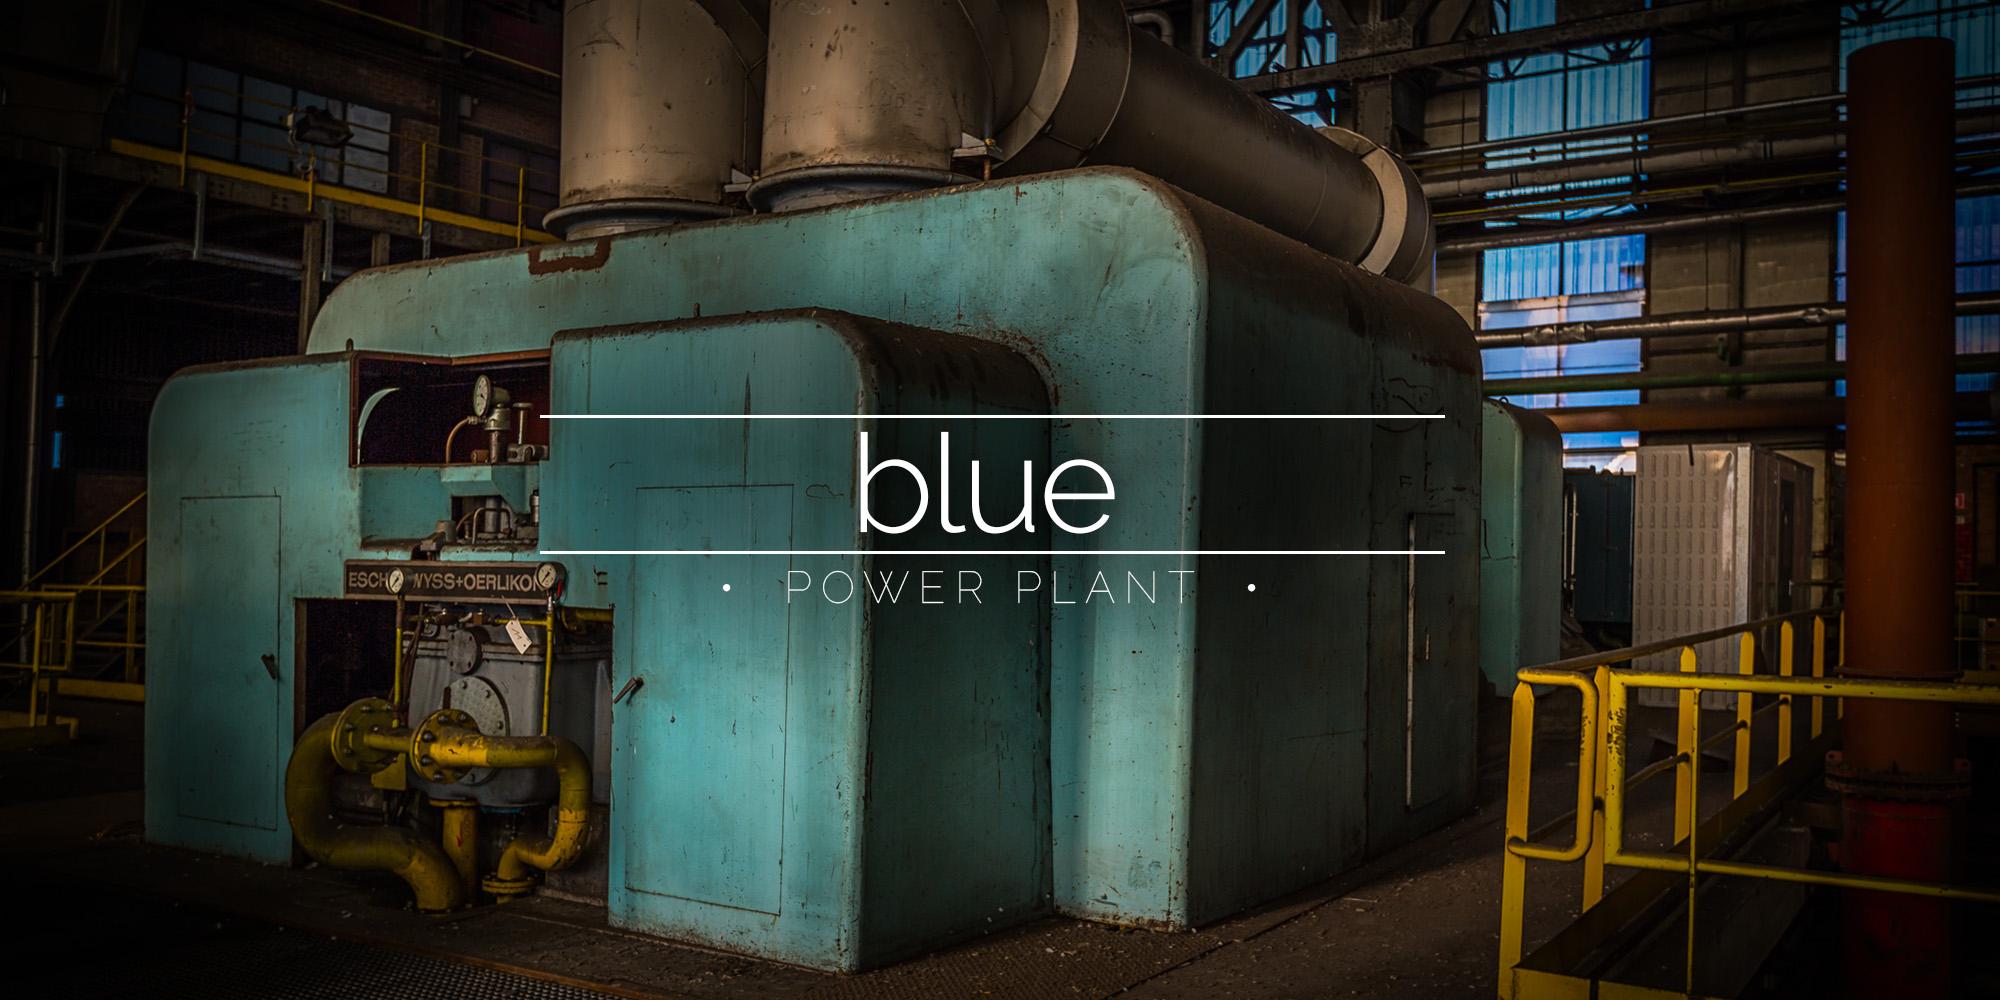 Cockerill-Sambre Coke Works Power Station, Charleroi, Belgium